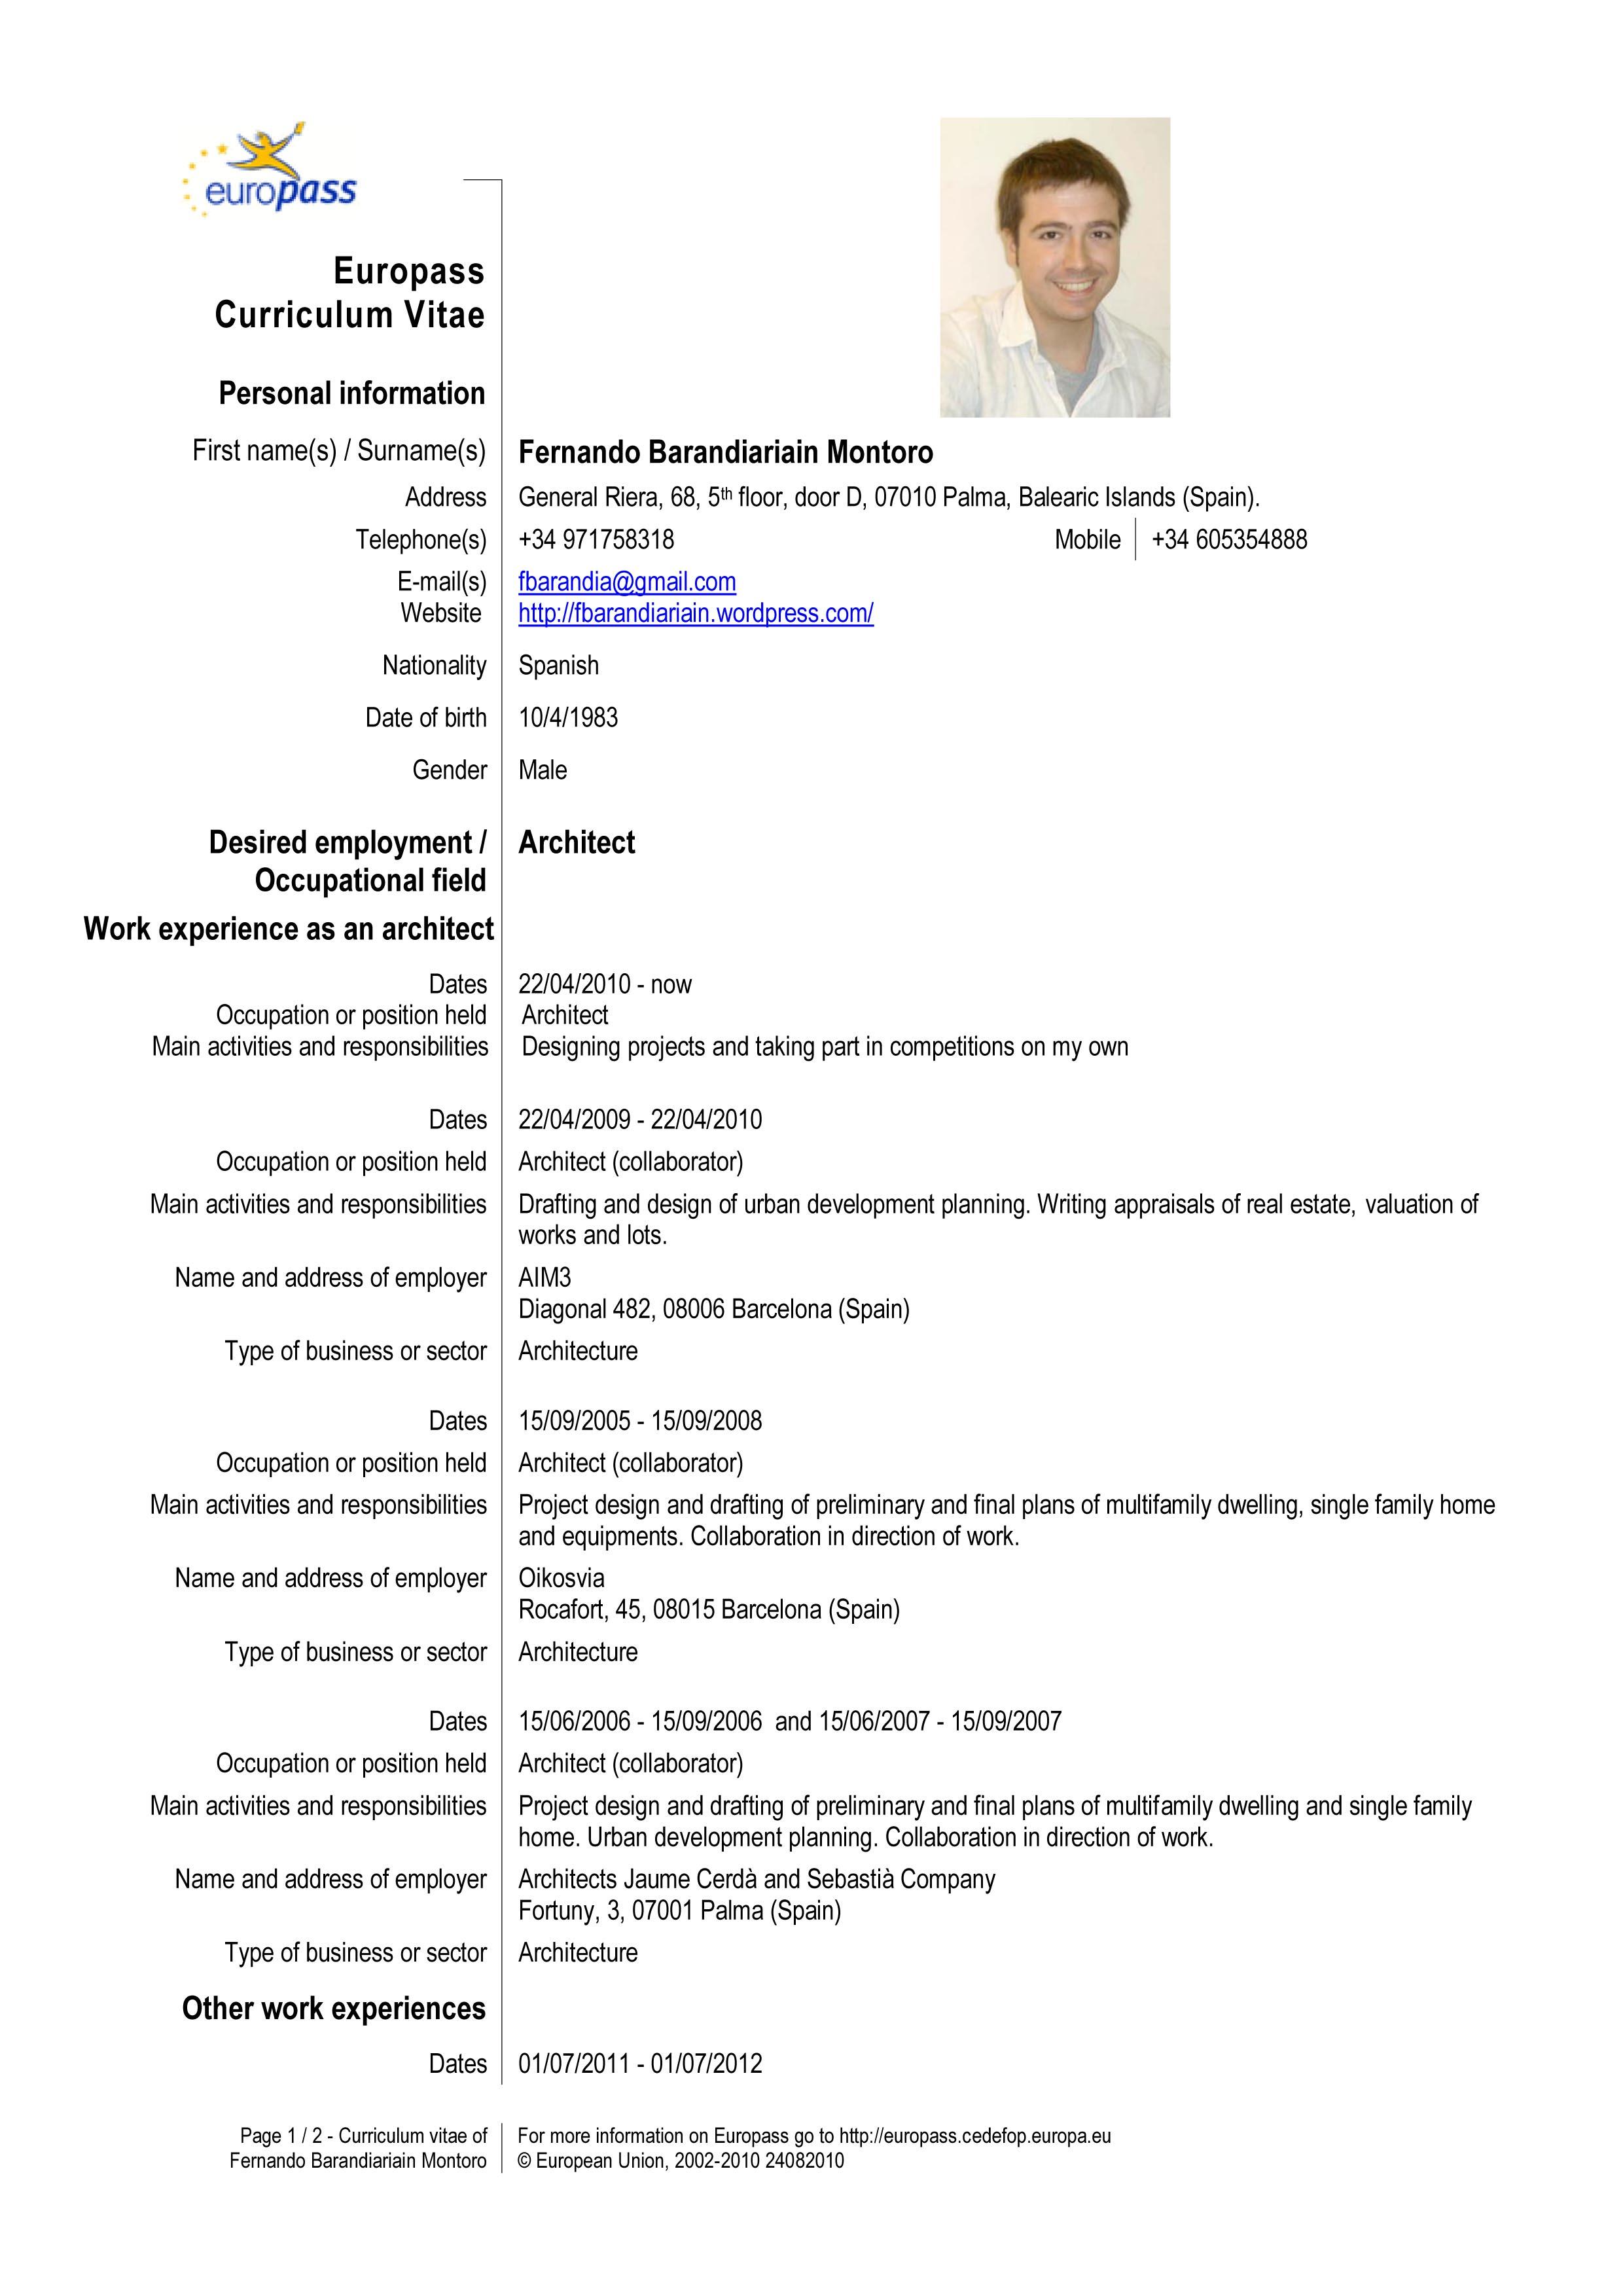 europass cv english online editor